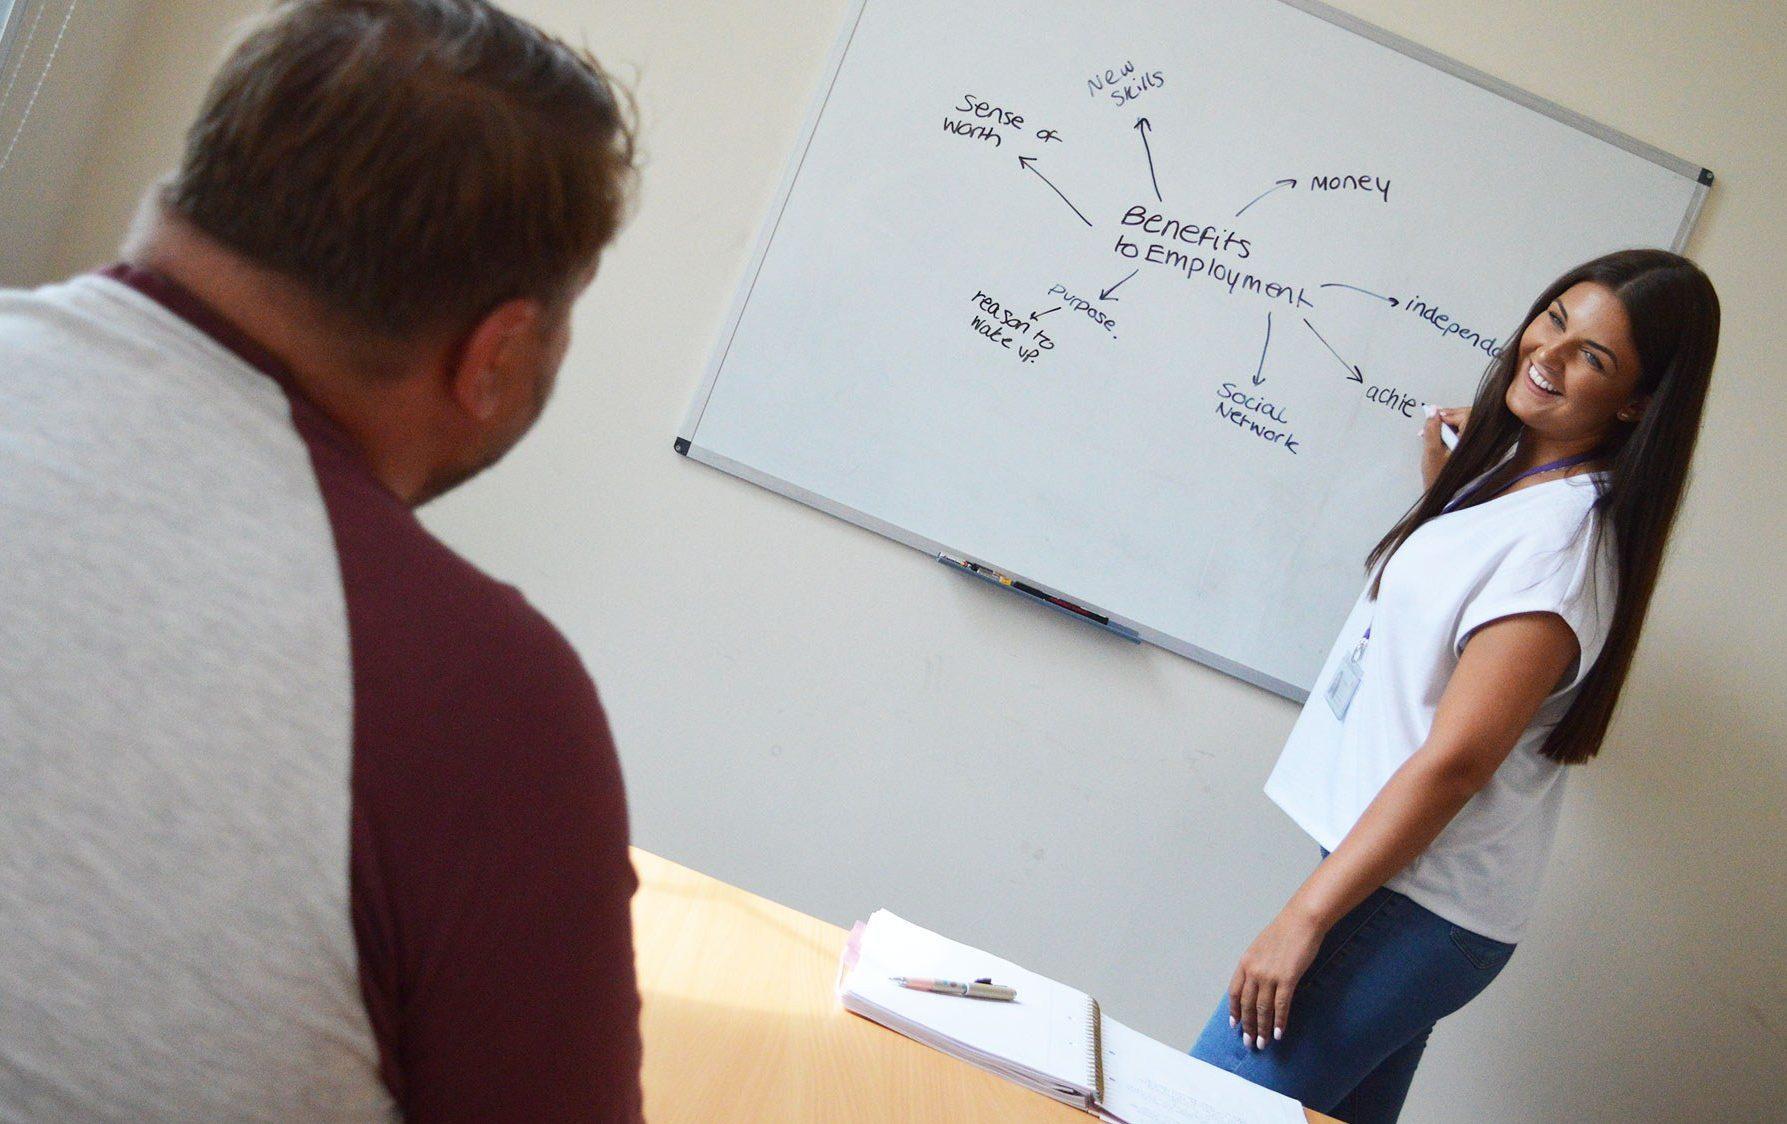 Employment-training.jpg